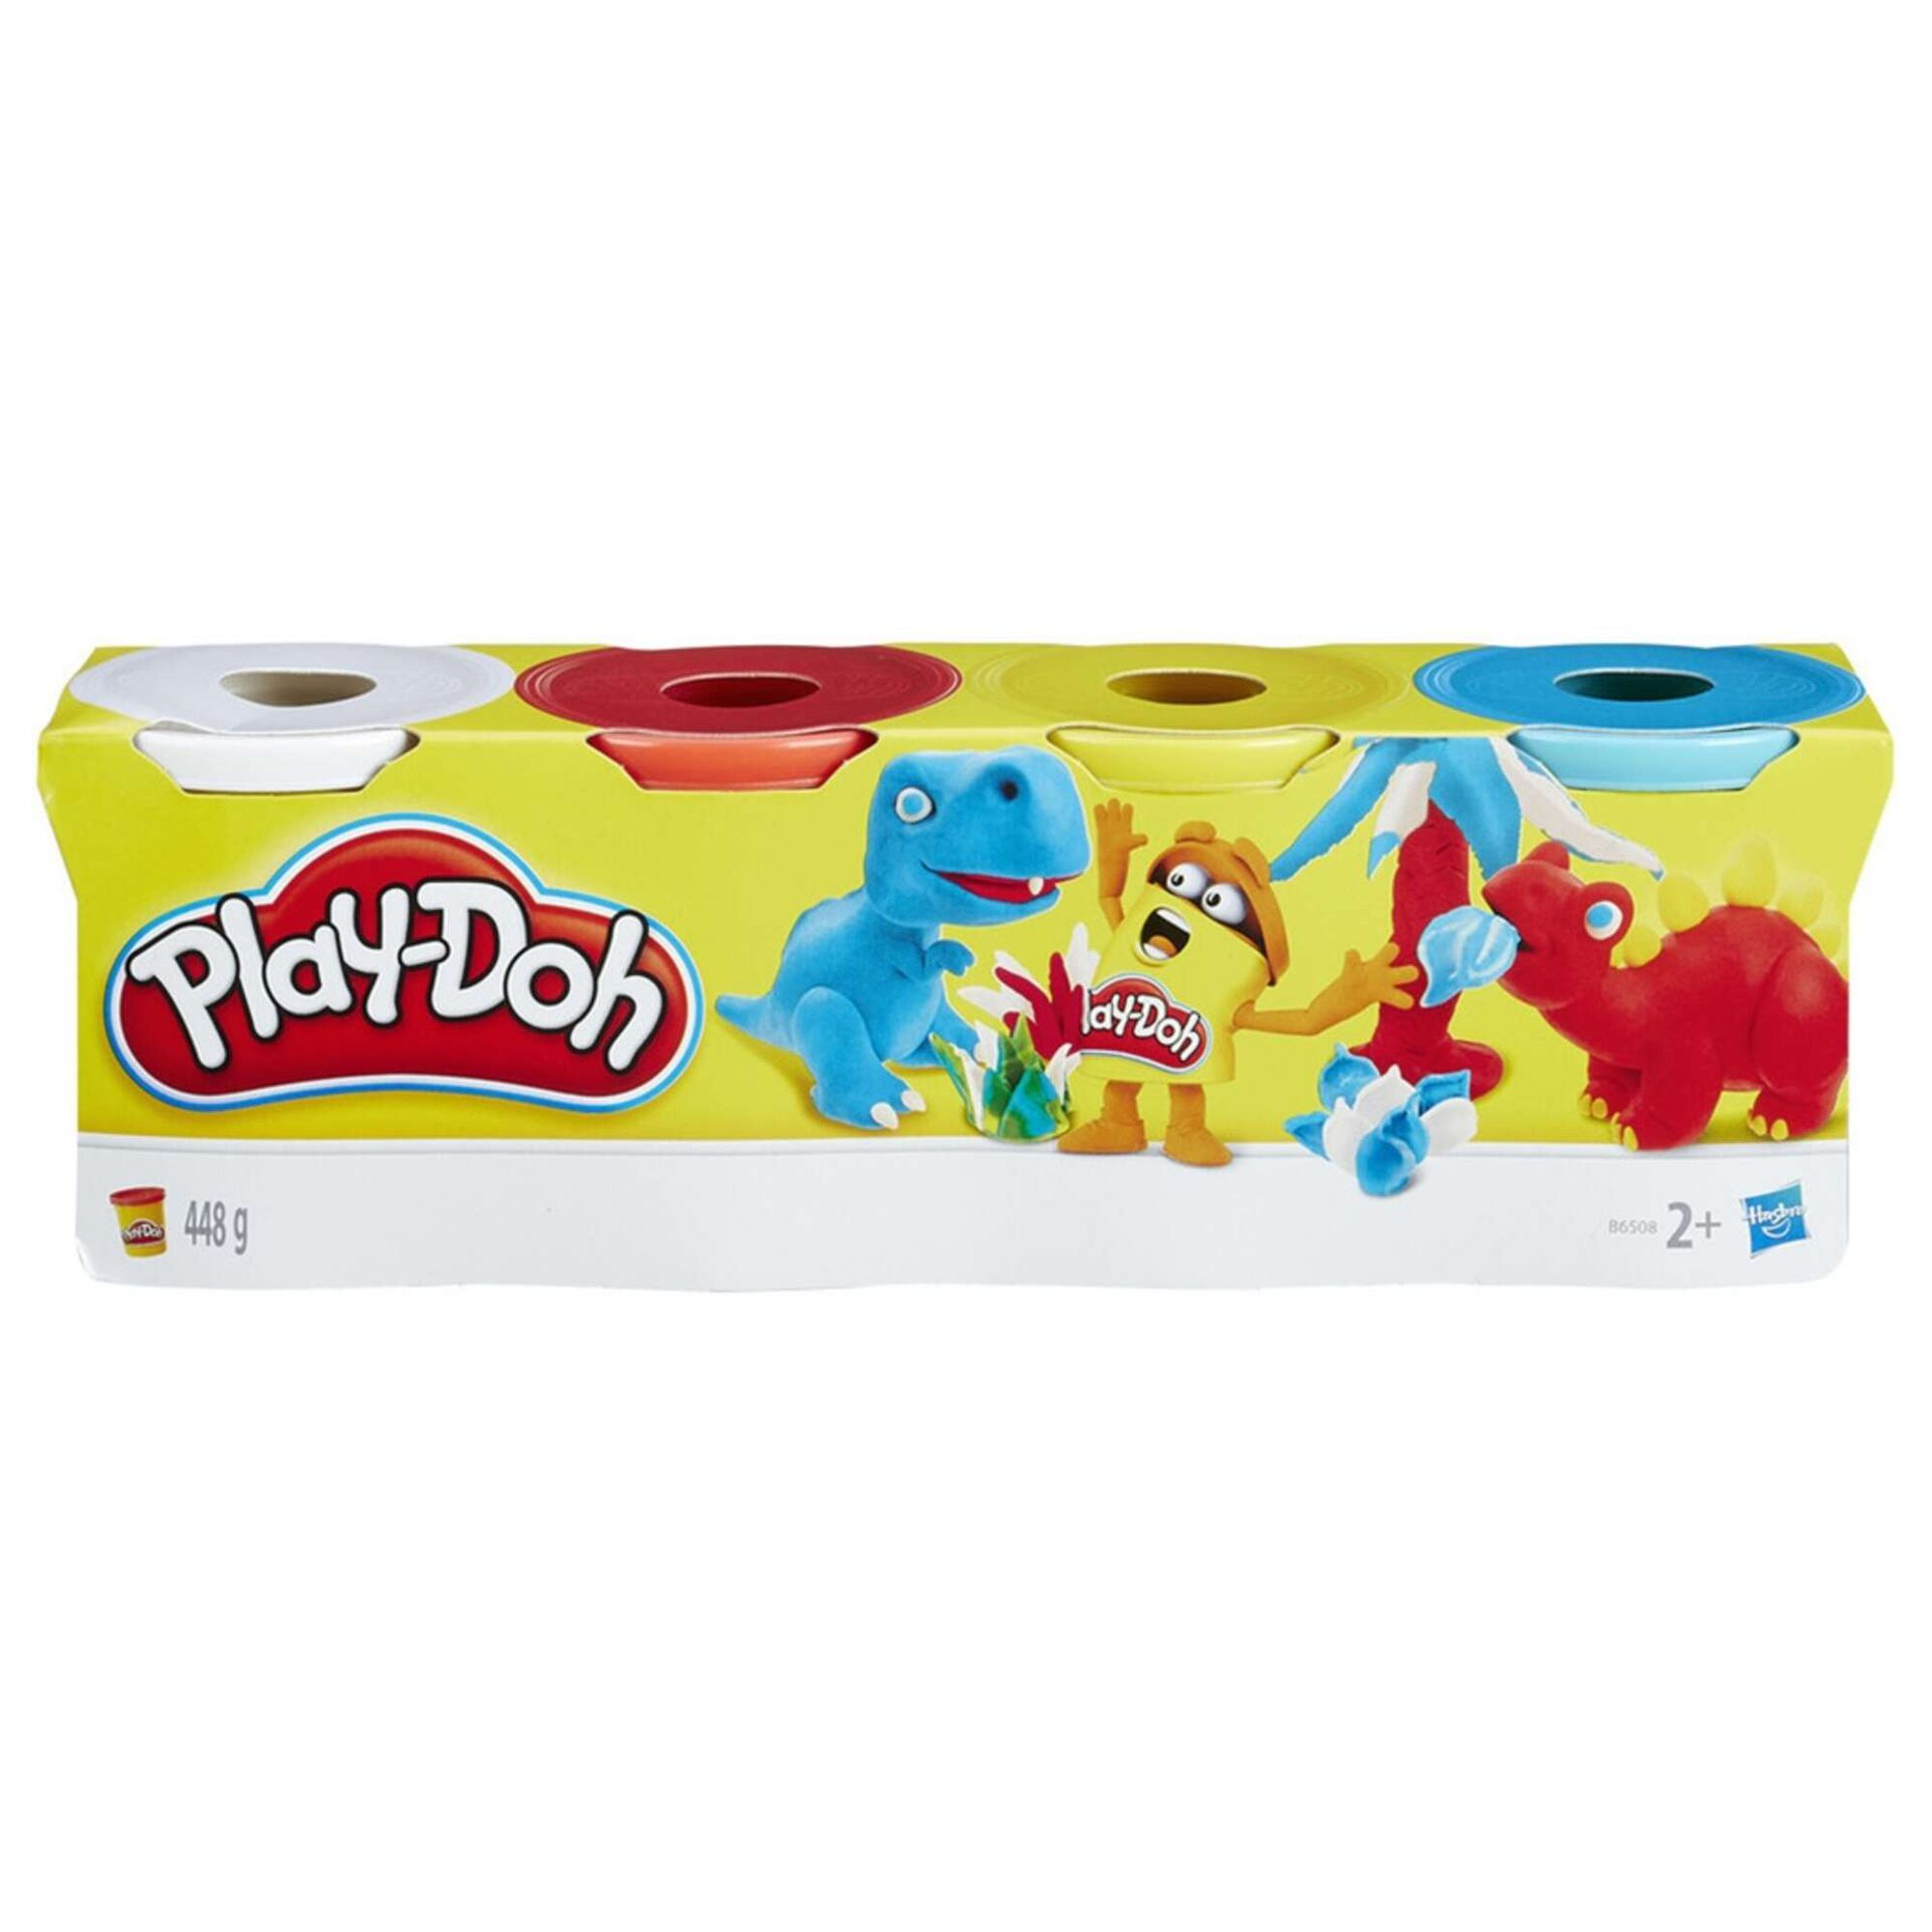 Plasticina Pack 4 Potes